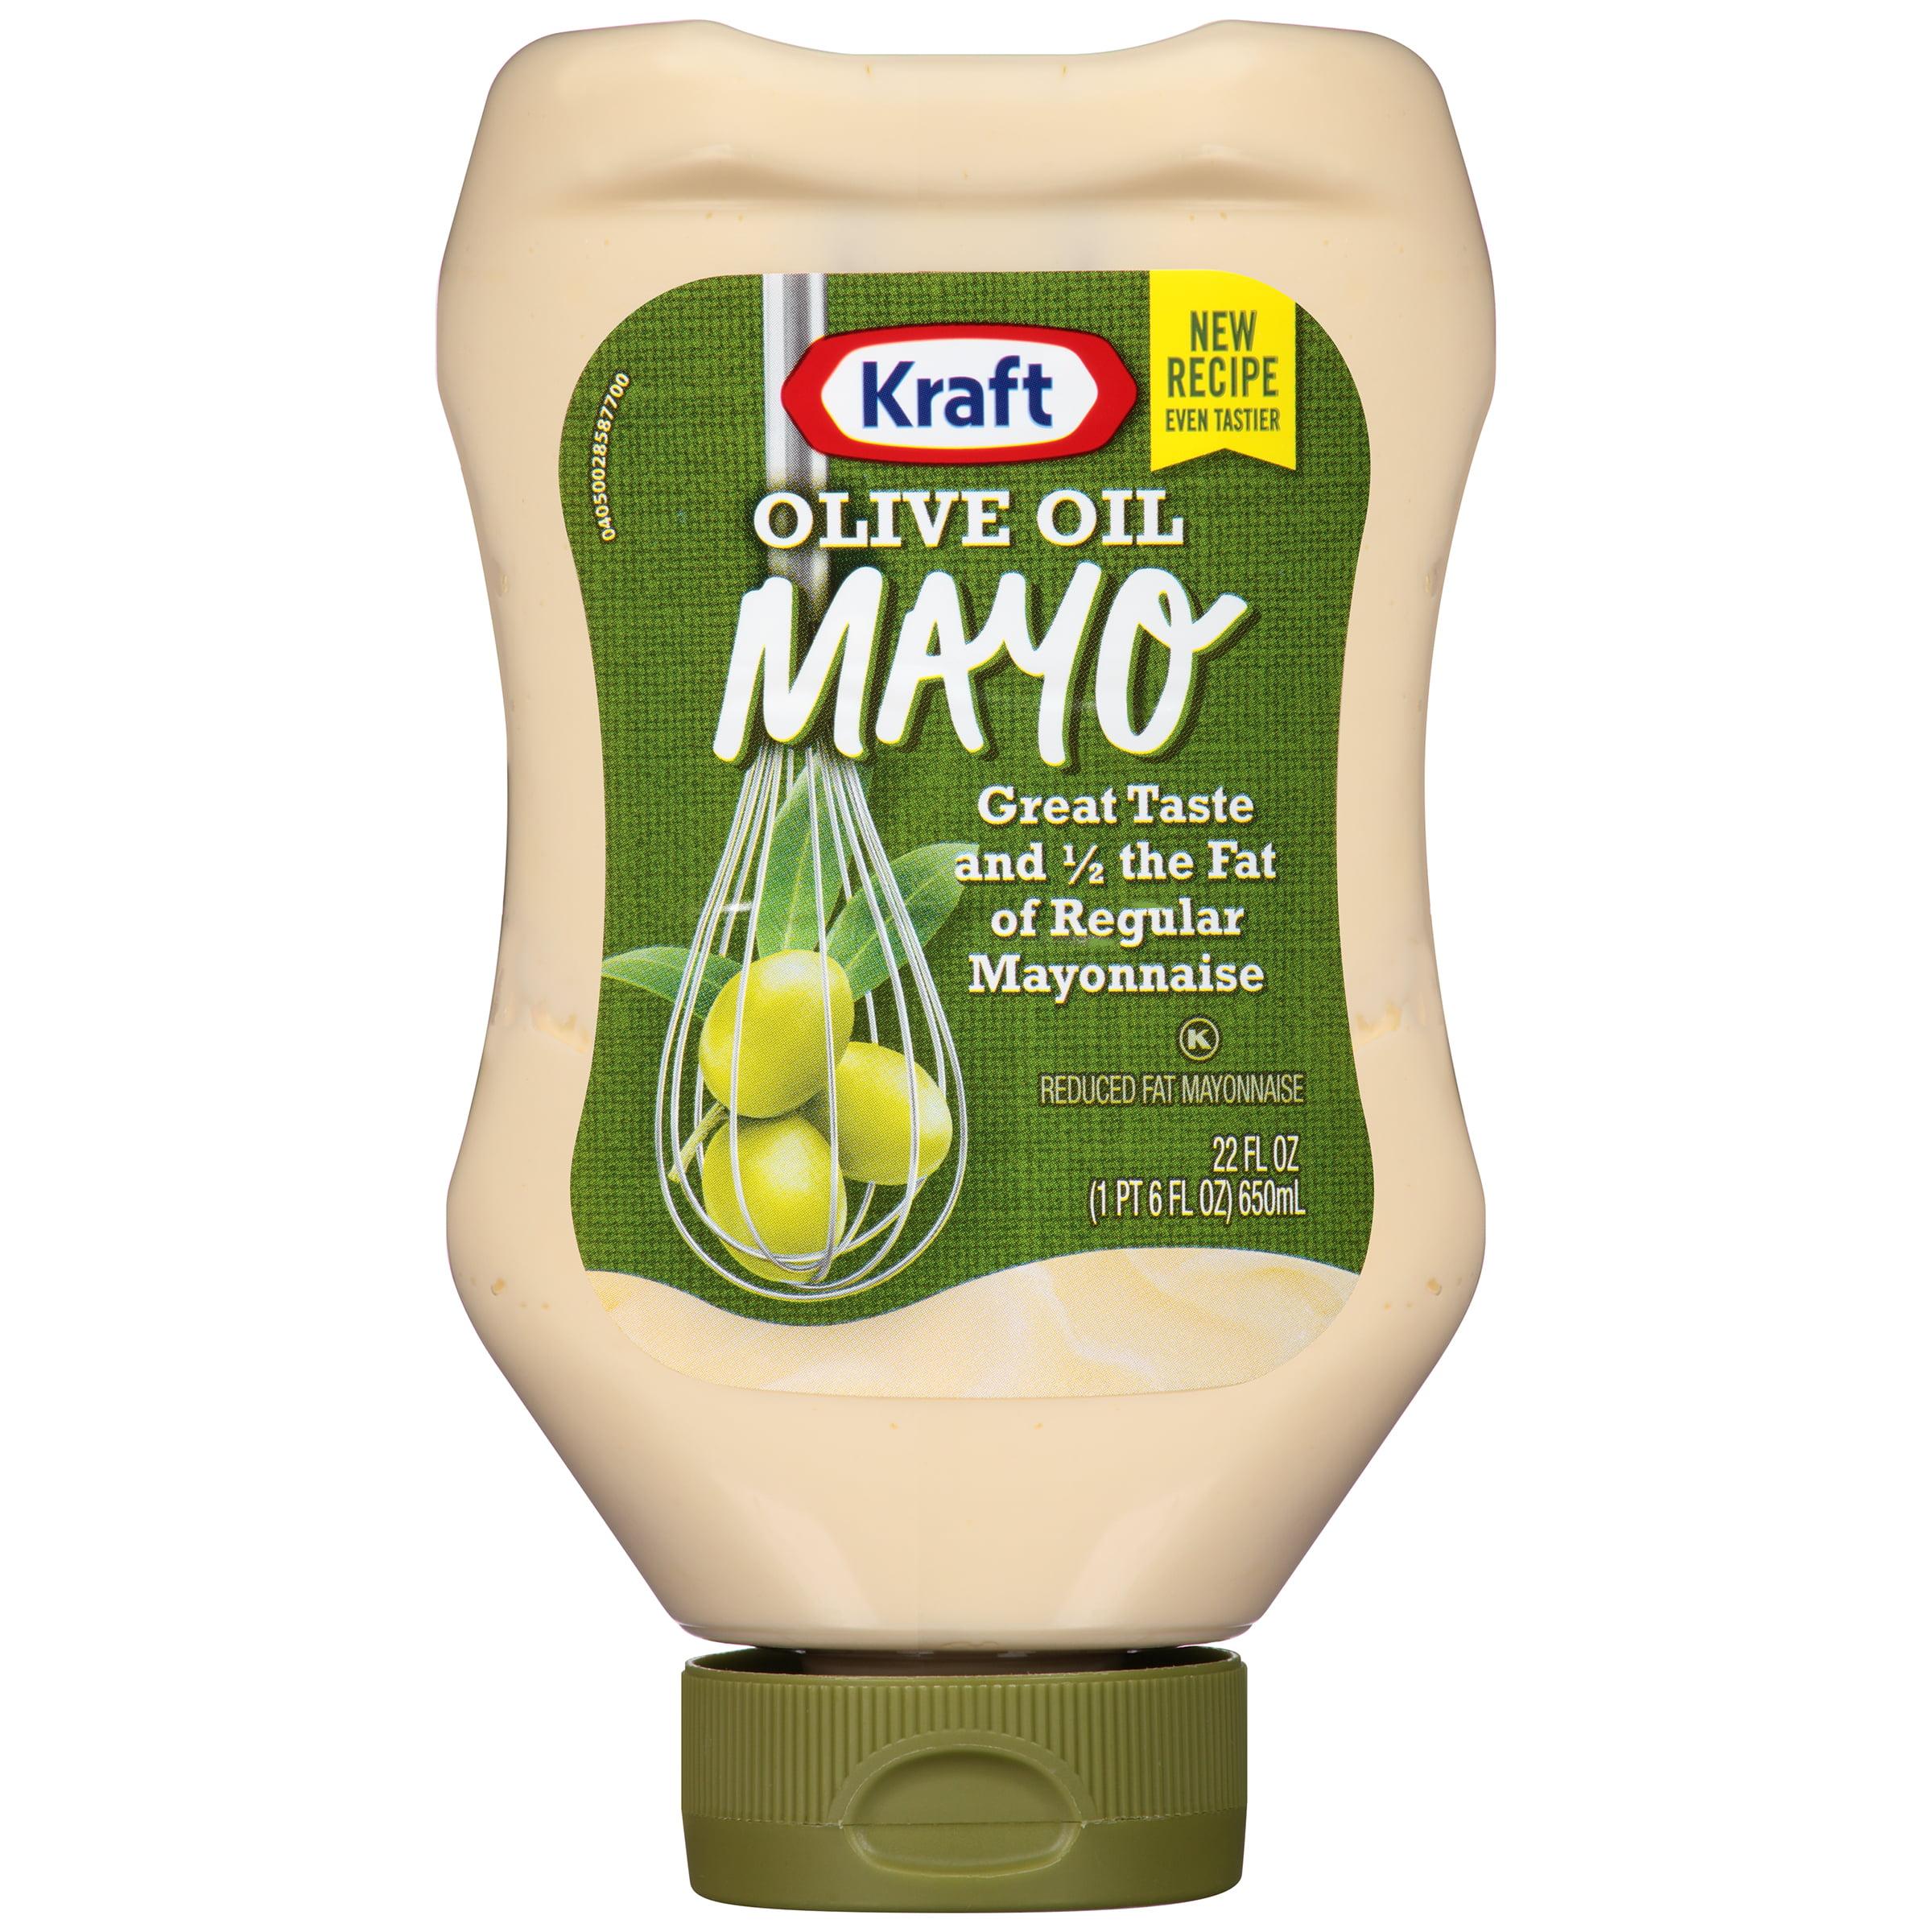 Kraft Mayo Mayonnaise Olive Oil Reduced Fat, 22 fl oz, Bottle